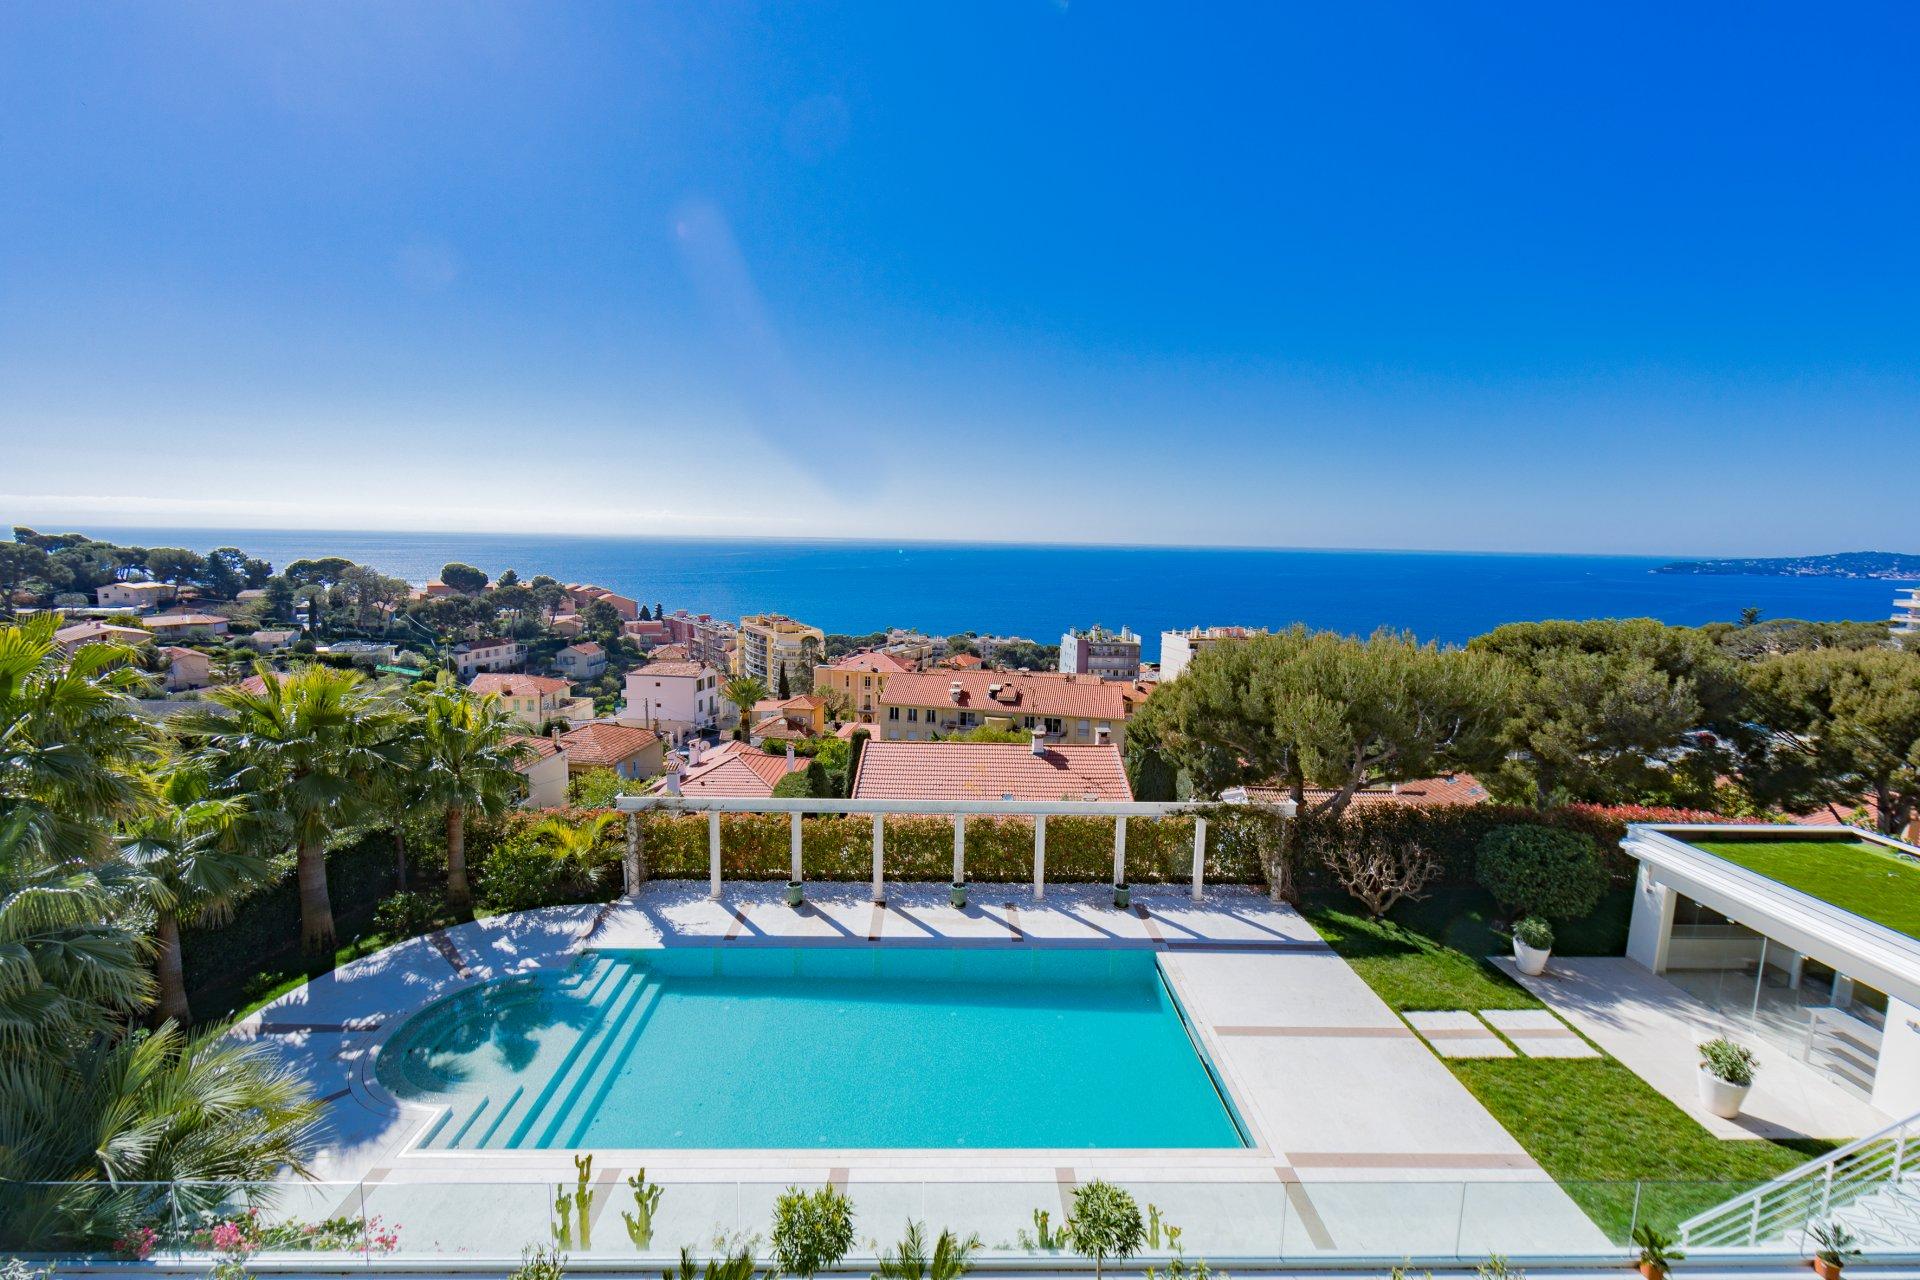 Cap d'Ail - Spacious modern villa with panoramic sea views  close to Monaco